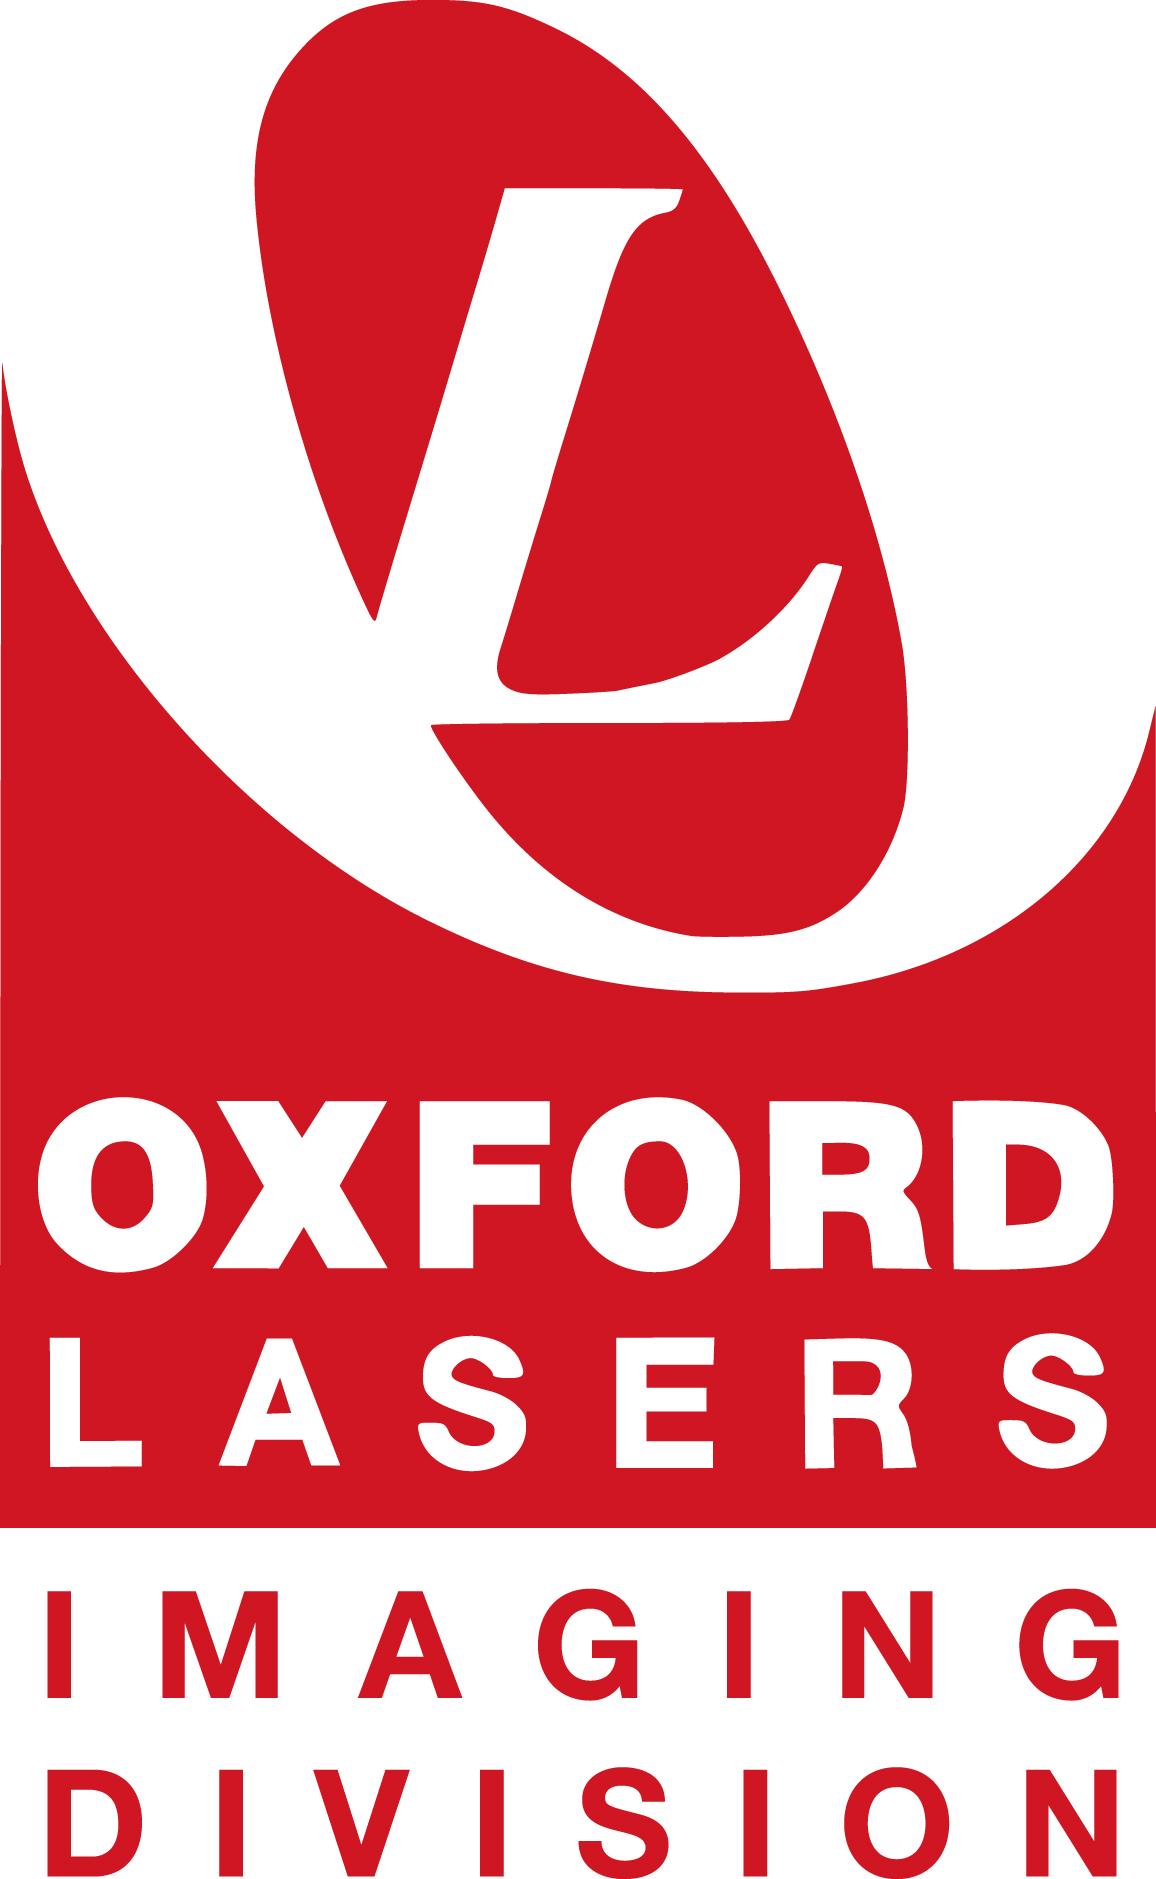 Oxford_Lasers.jpg